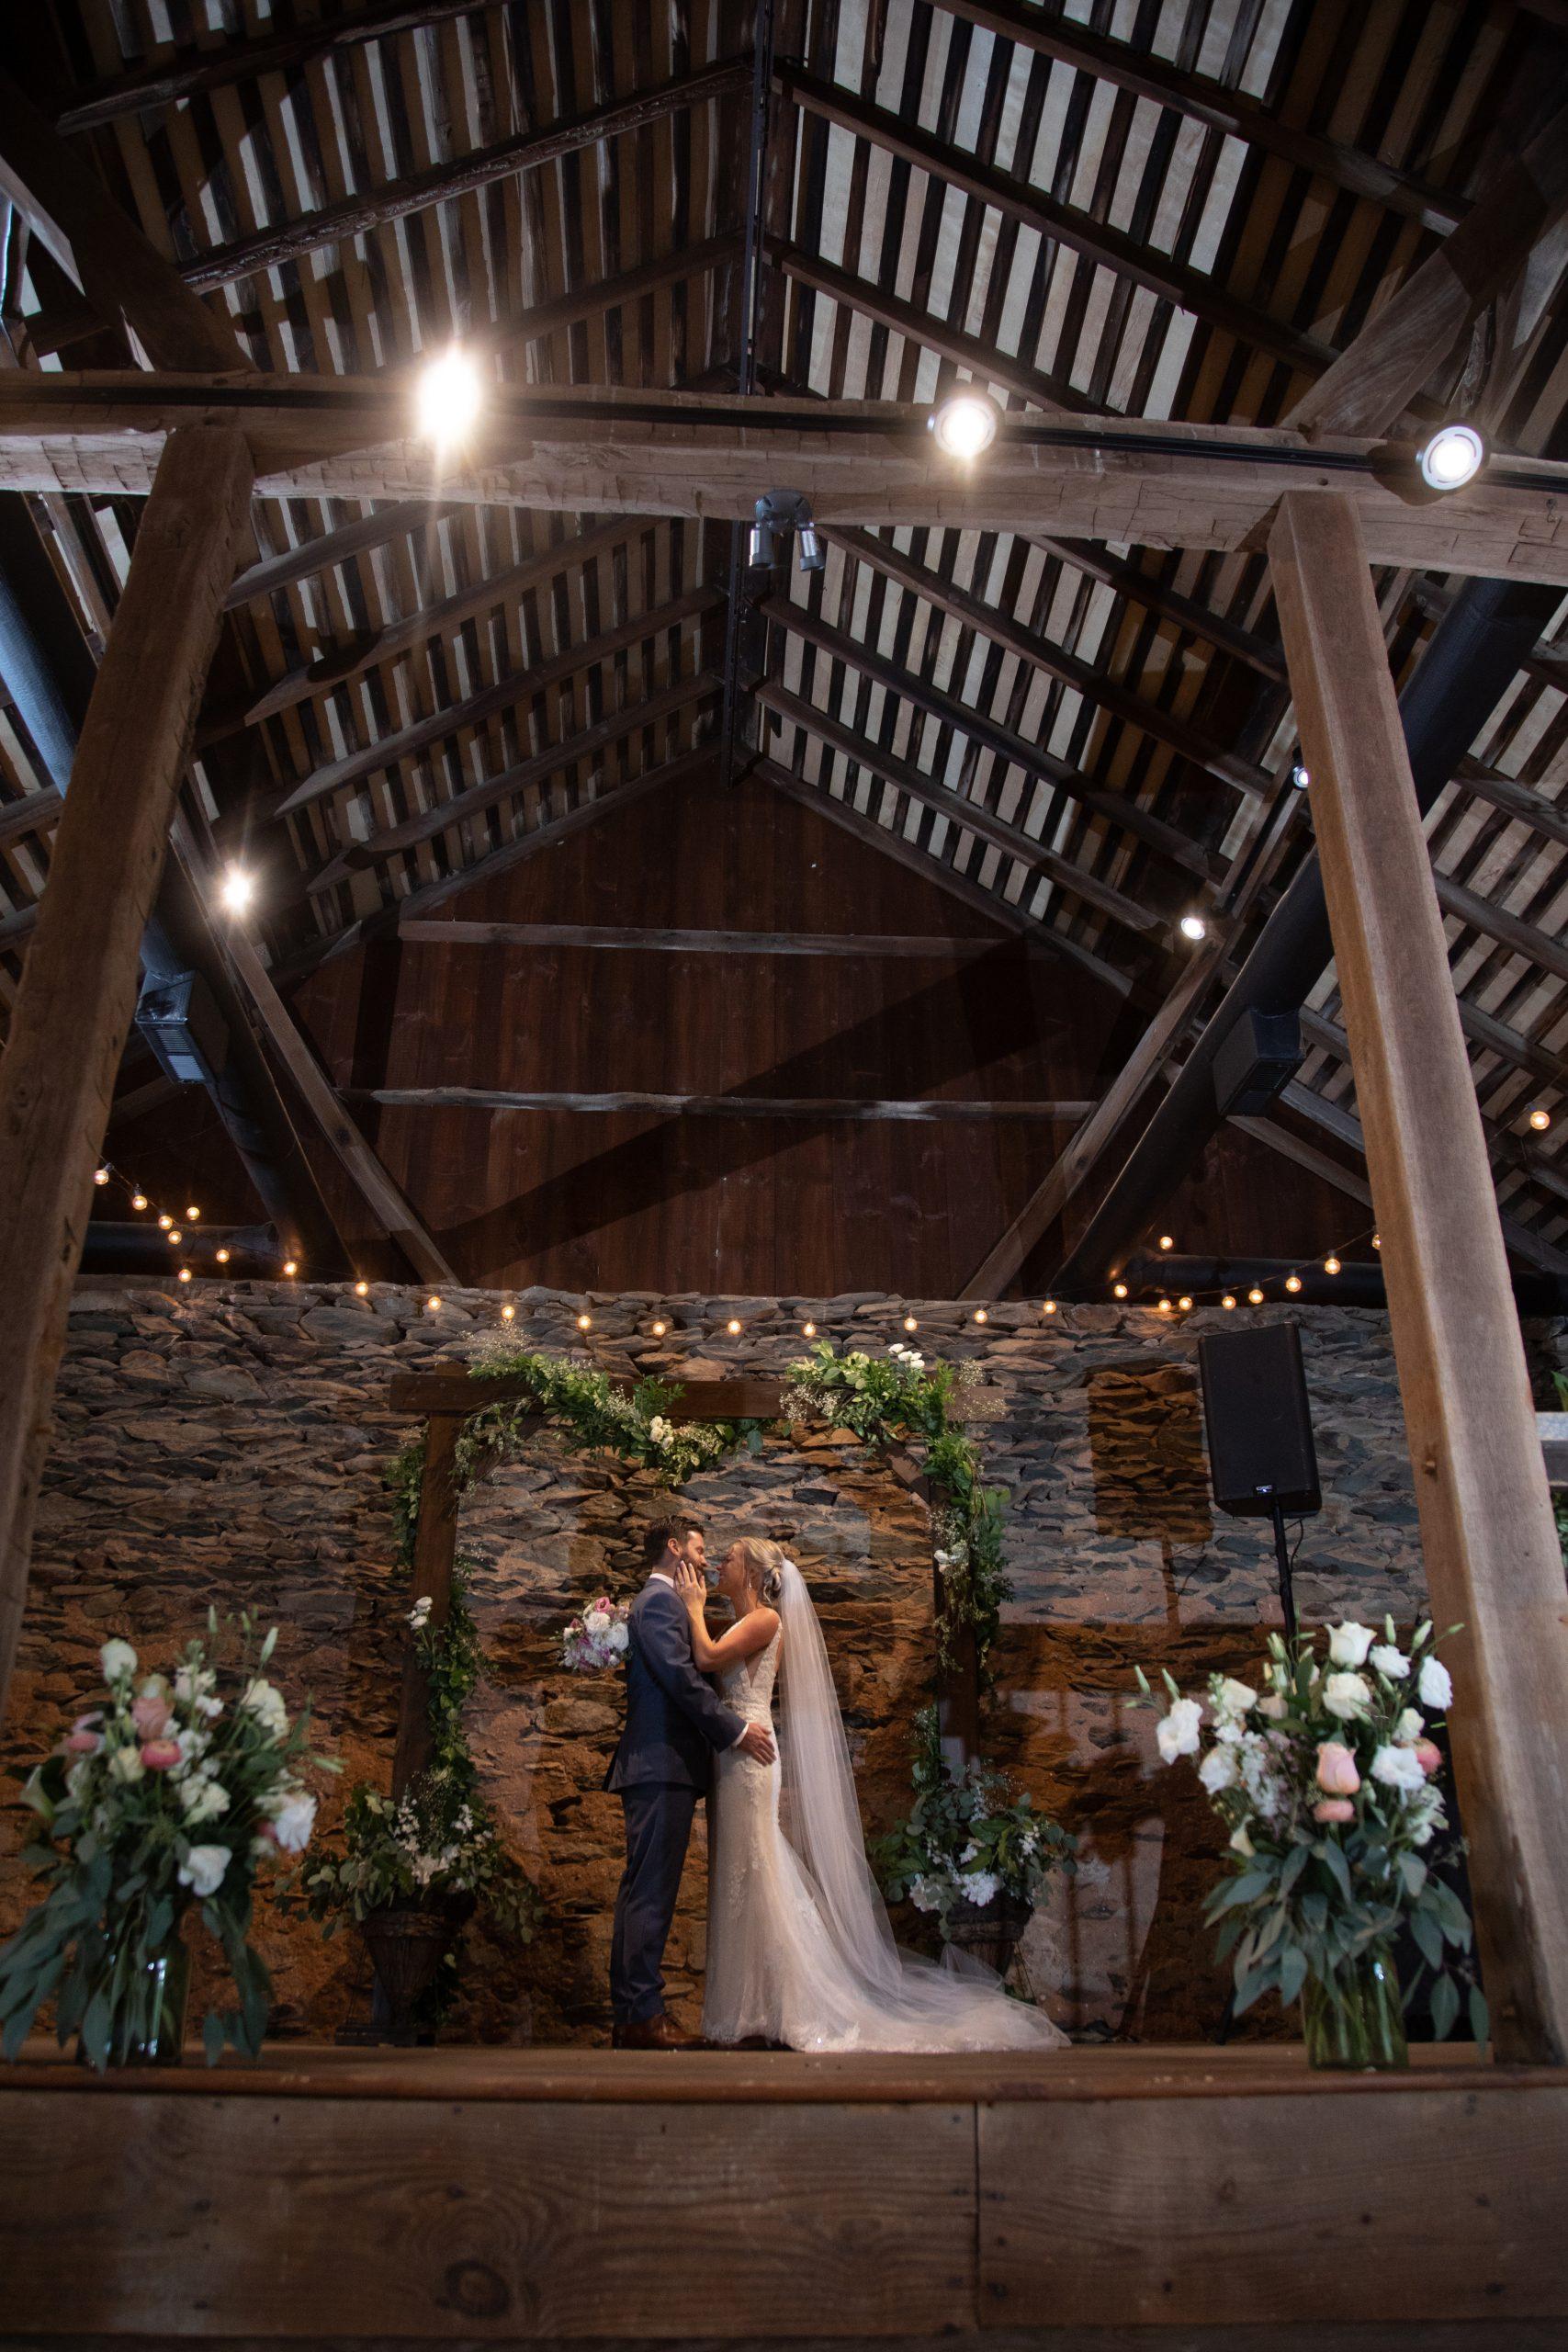 Kalero Vineyard wedding photographs, Stephanie Leigh Photography & Design